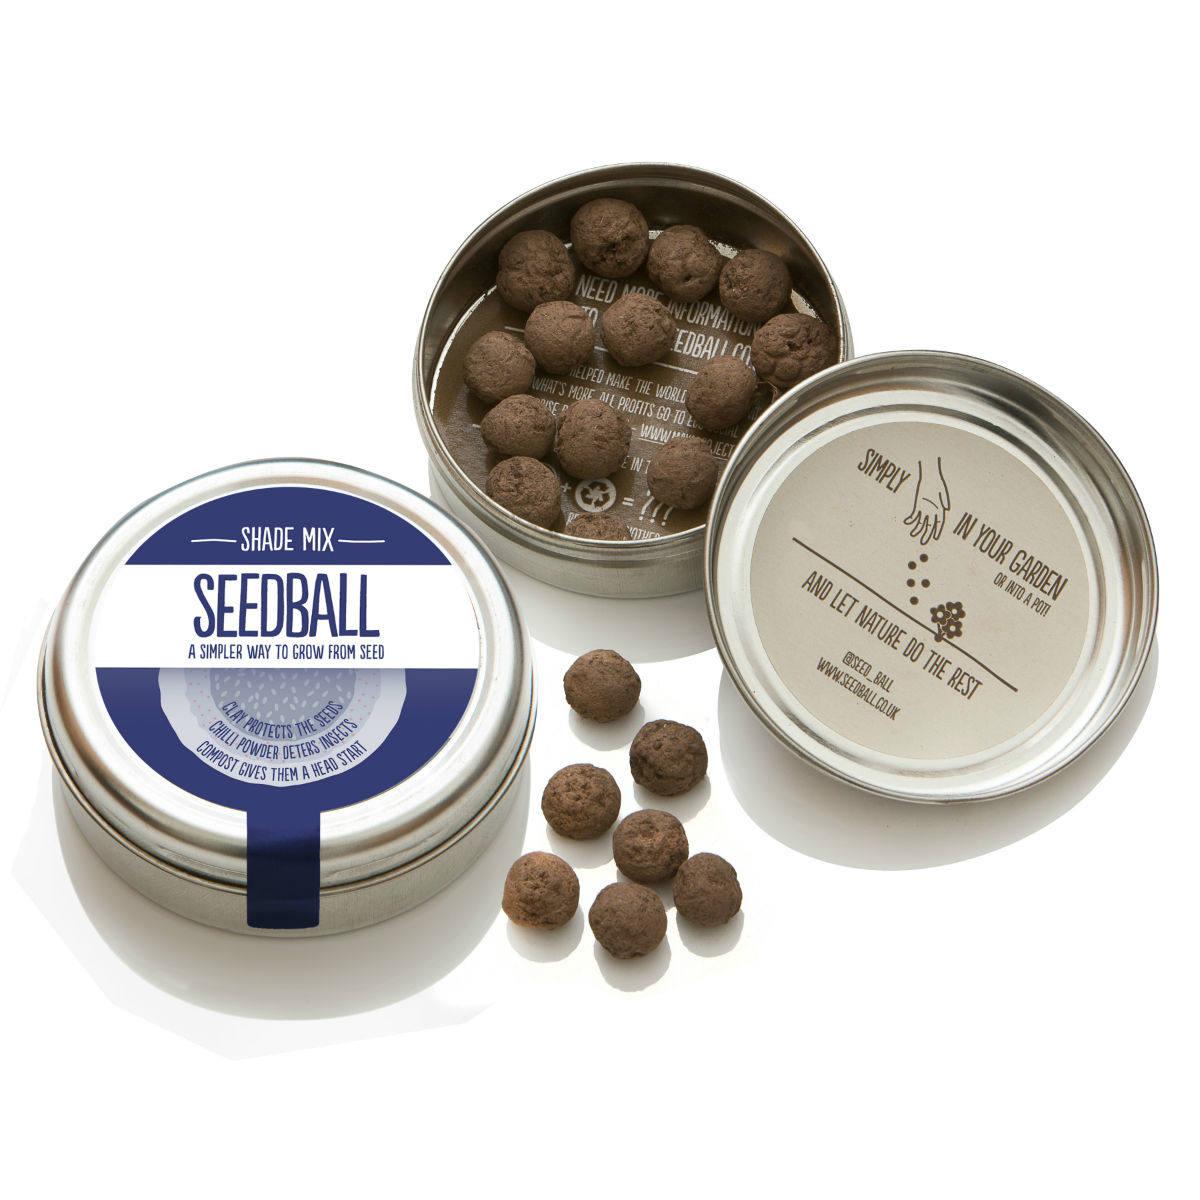 Seedball Shade Mix | Restoration Yard